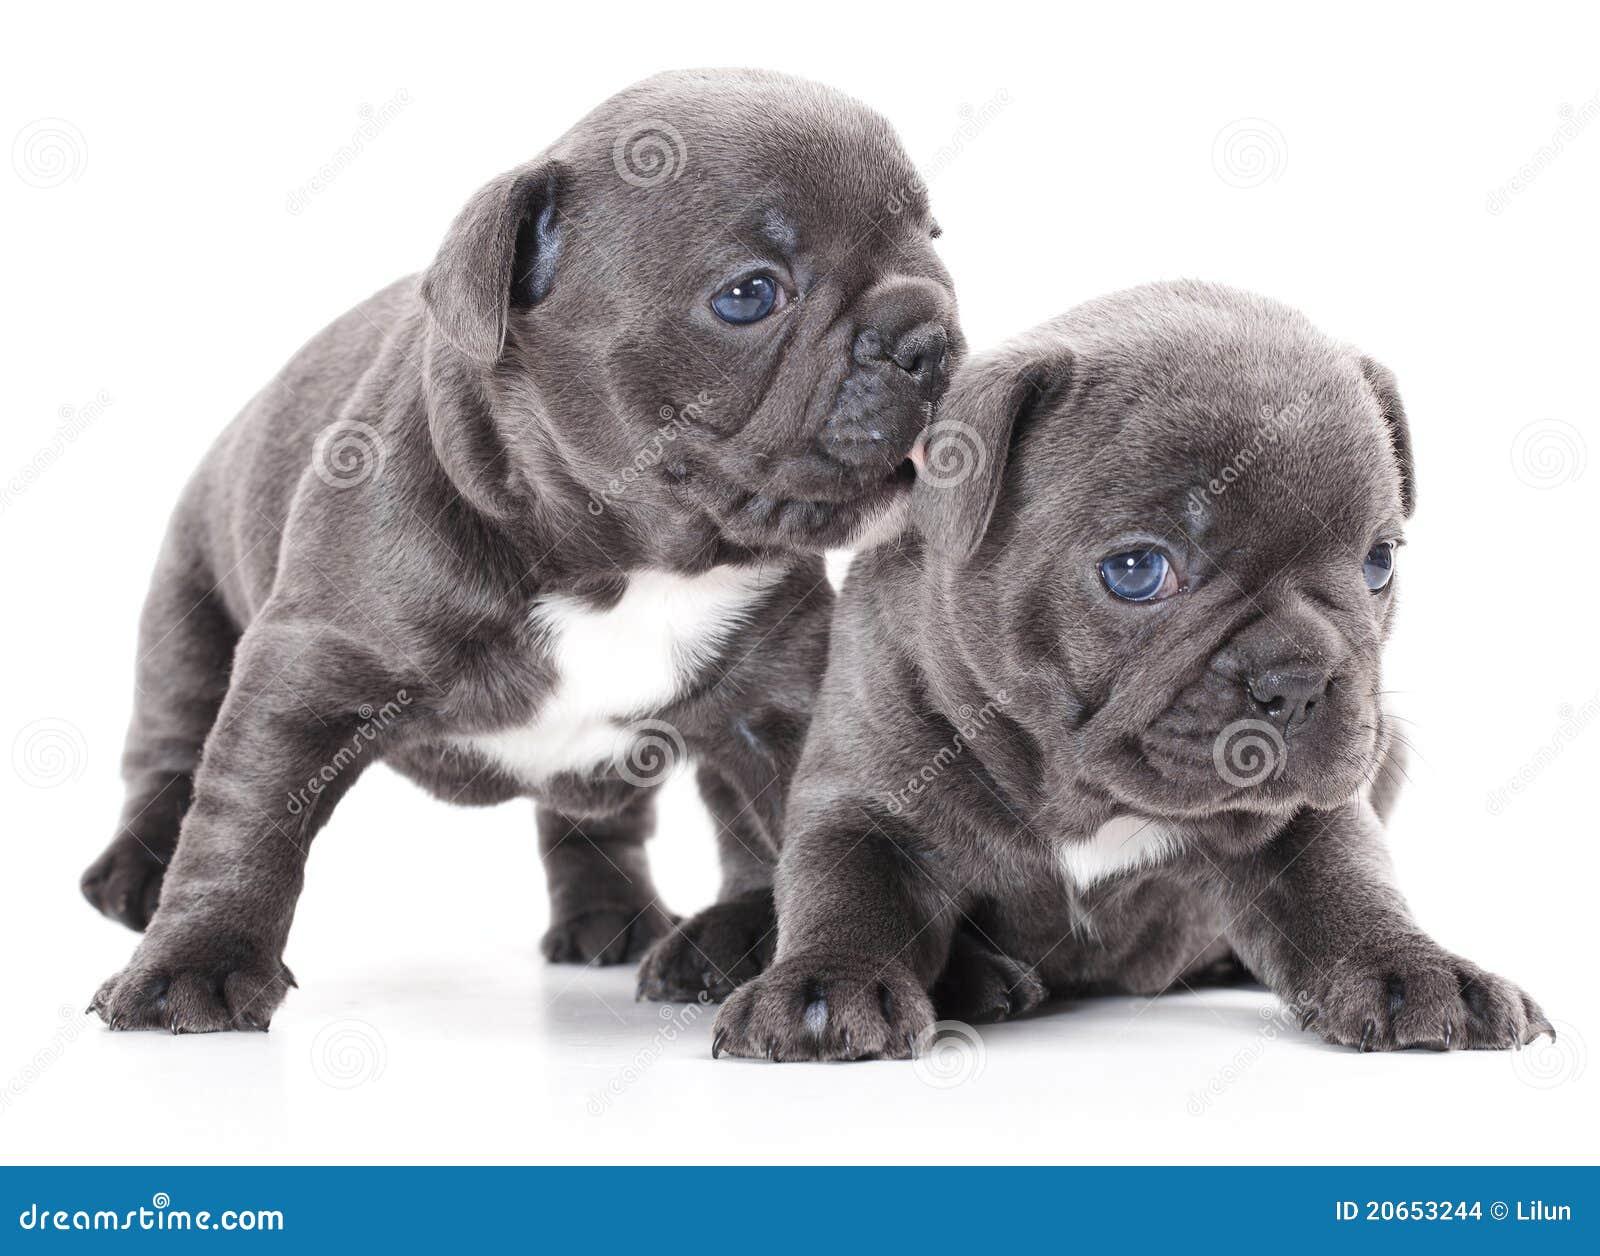 French Bulldog Puppy Stock Photo Image Of Animal Doggy 20653244